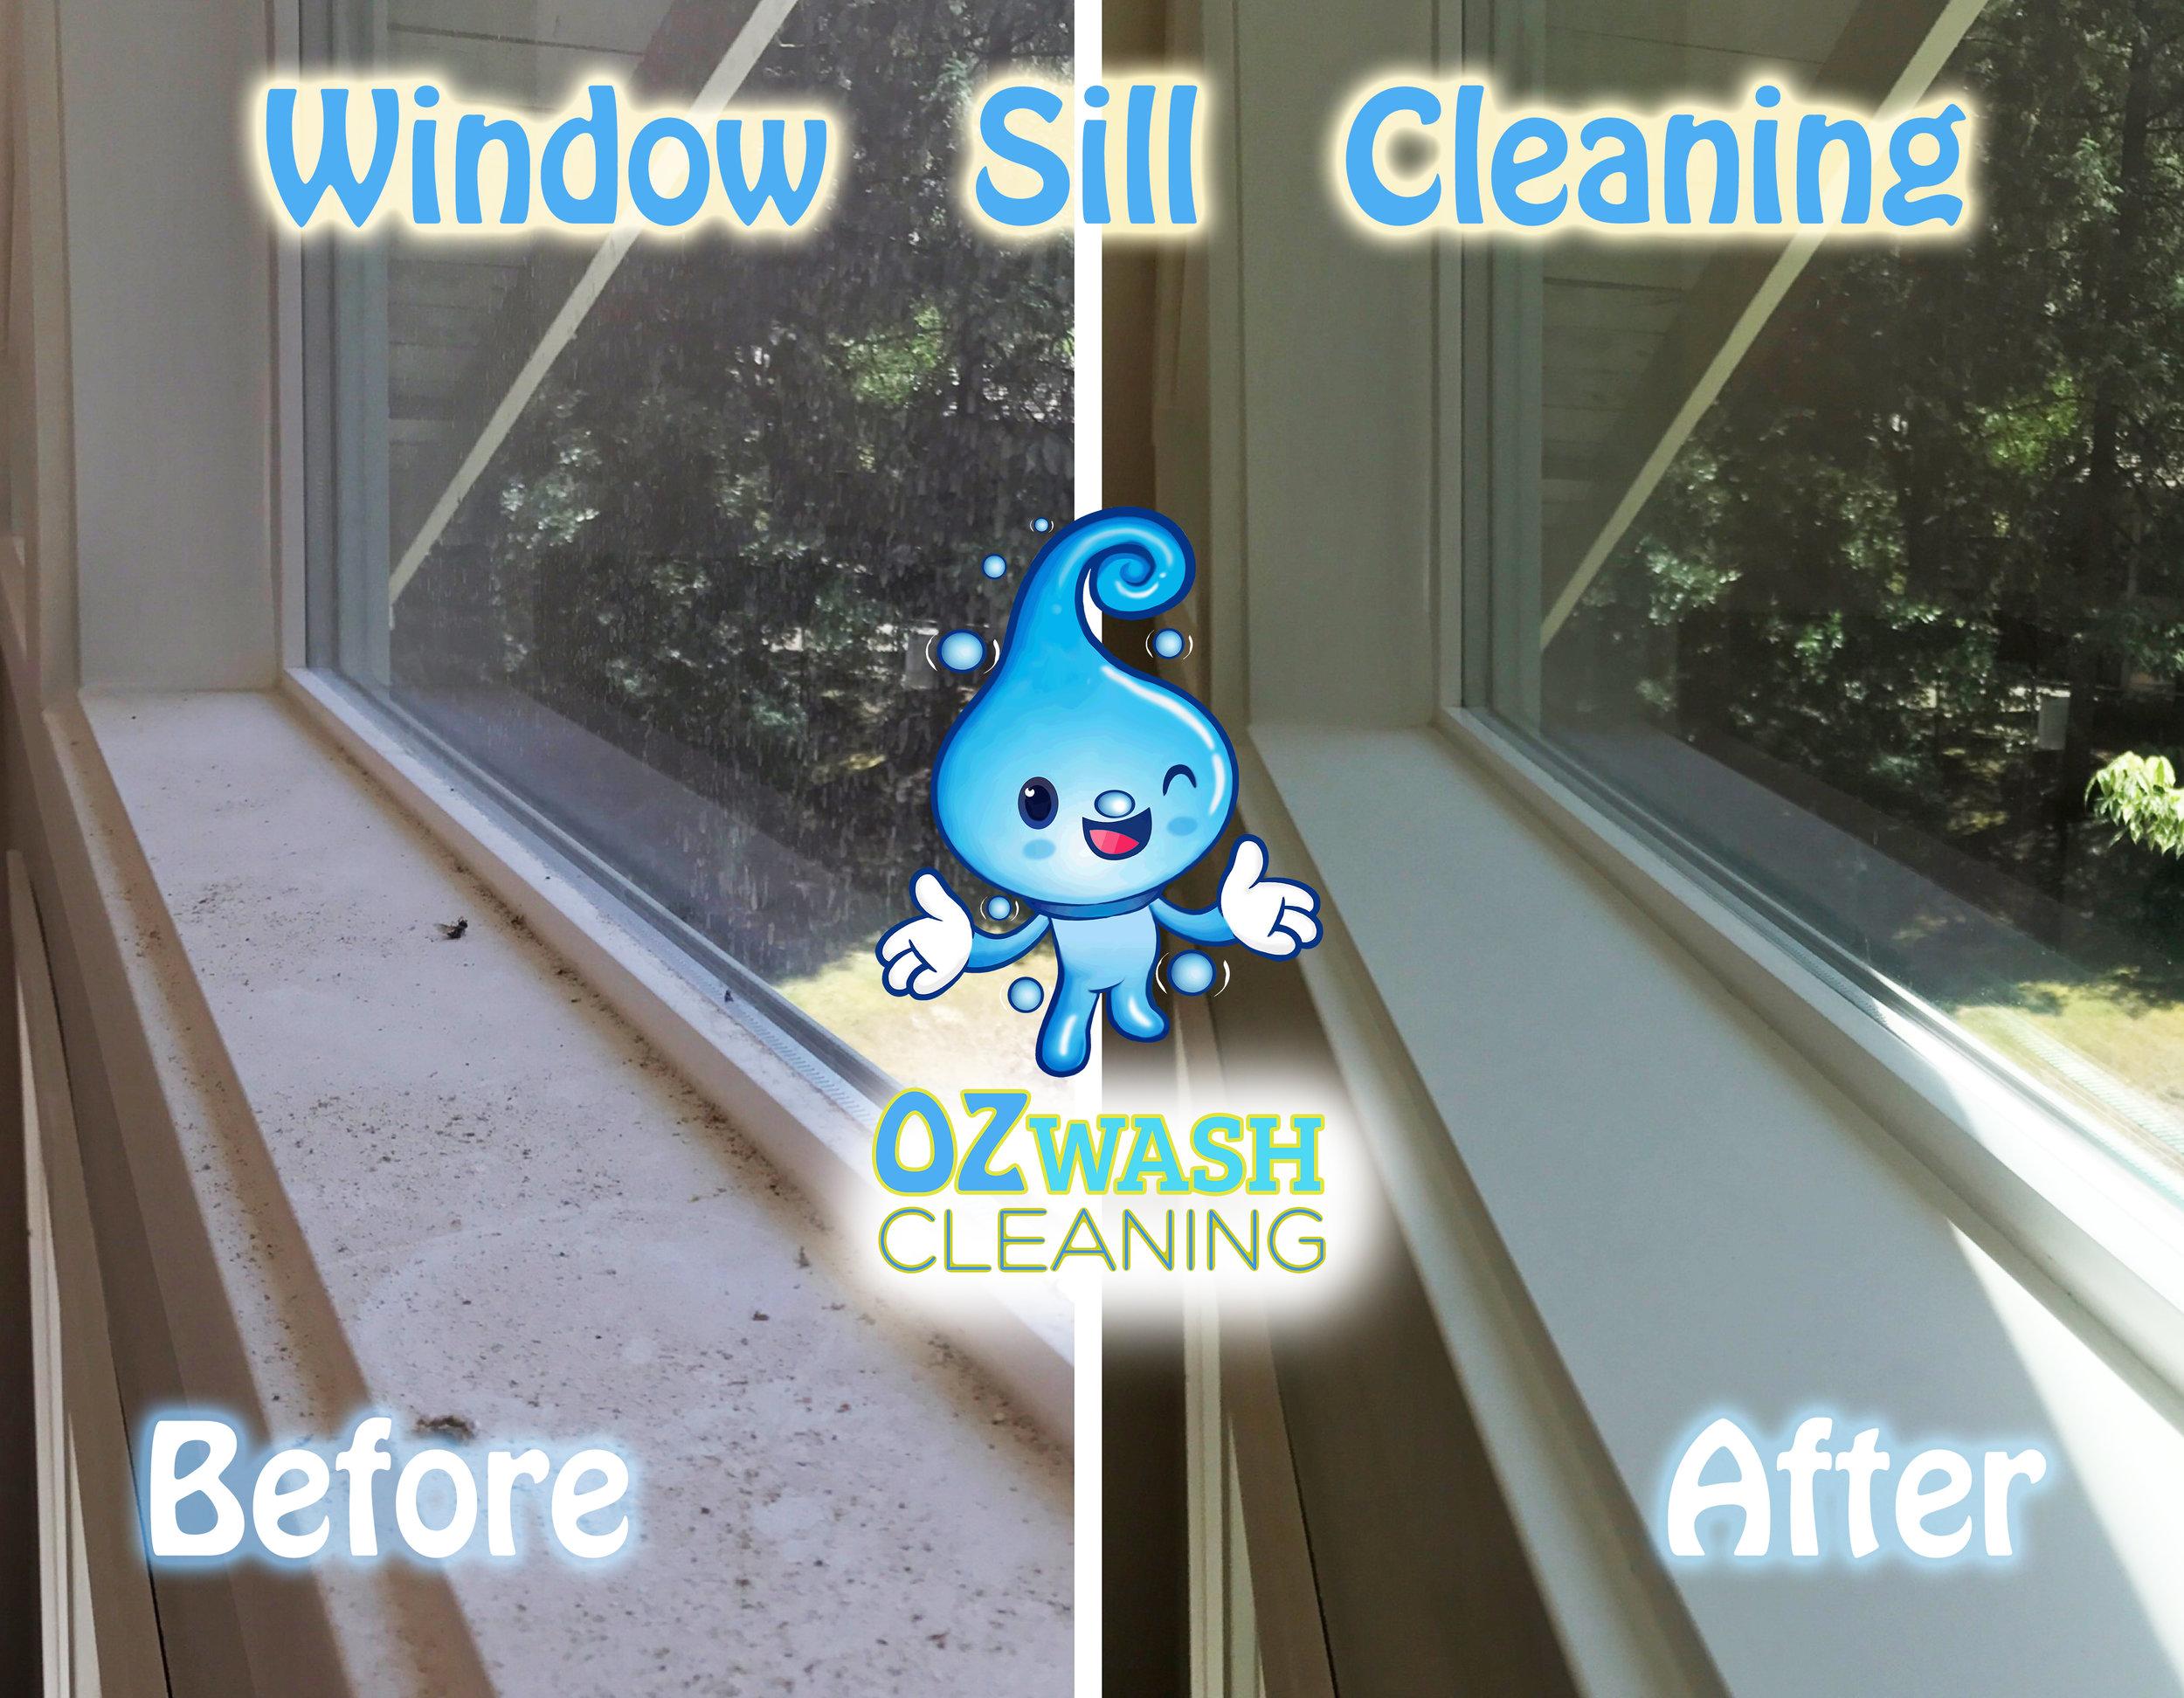 WindowCleaning4.jpg